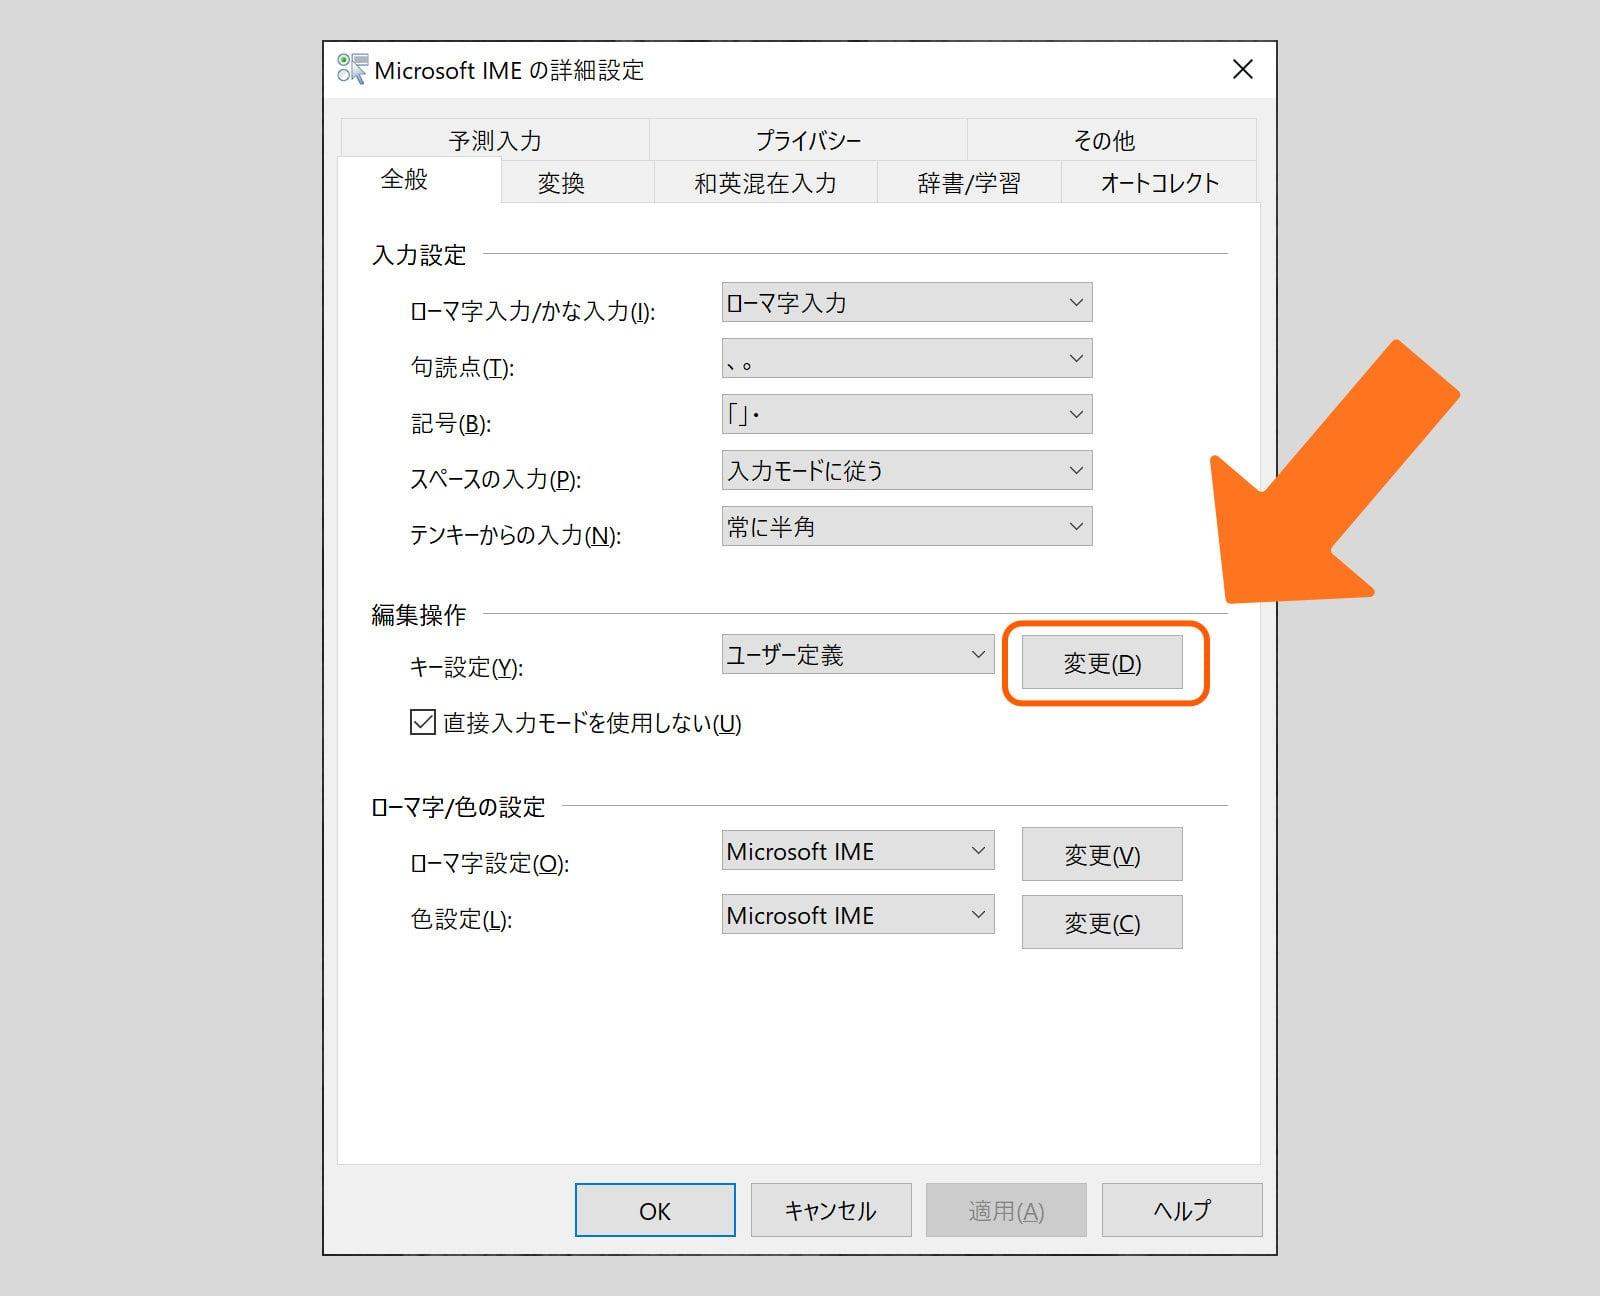 Microsoft IMEの詳細設定画面のキャプチャ画像